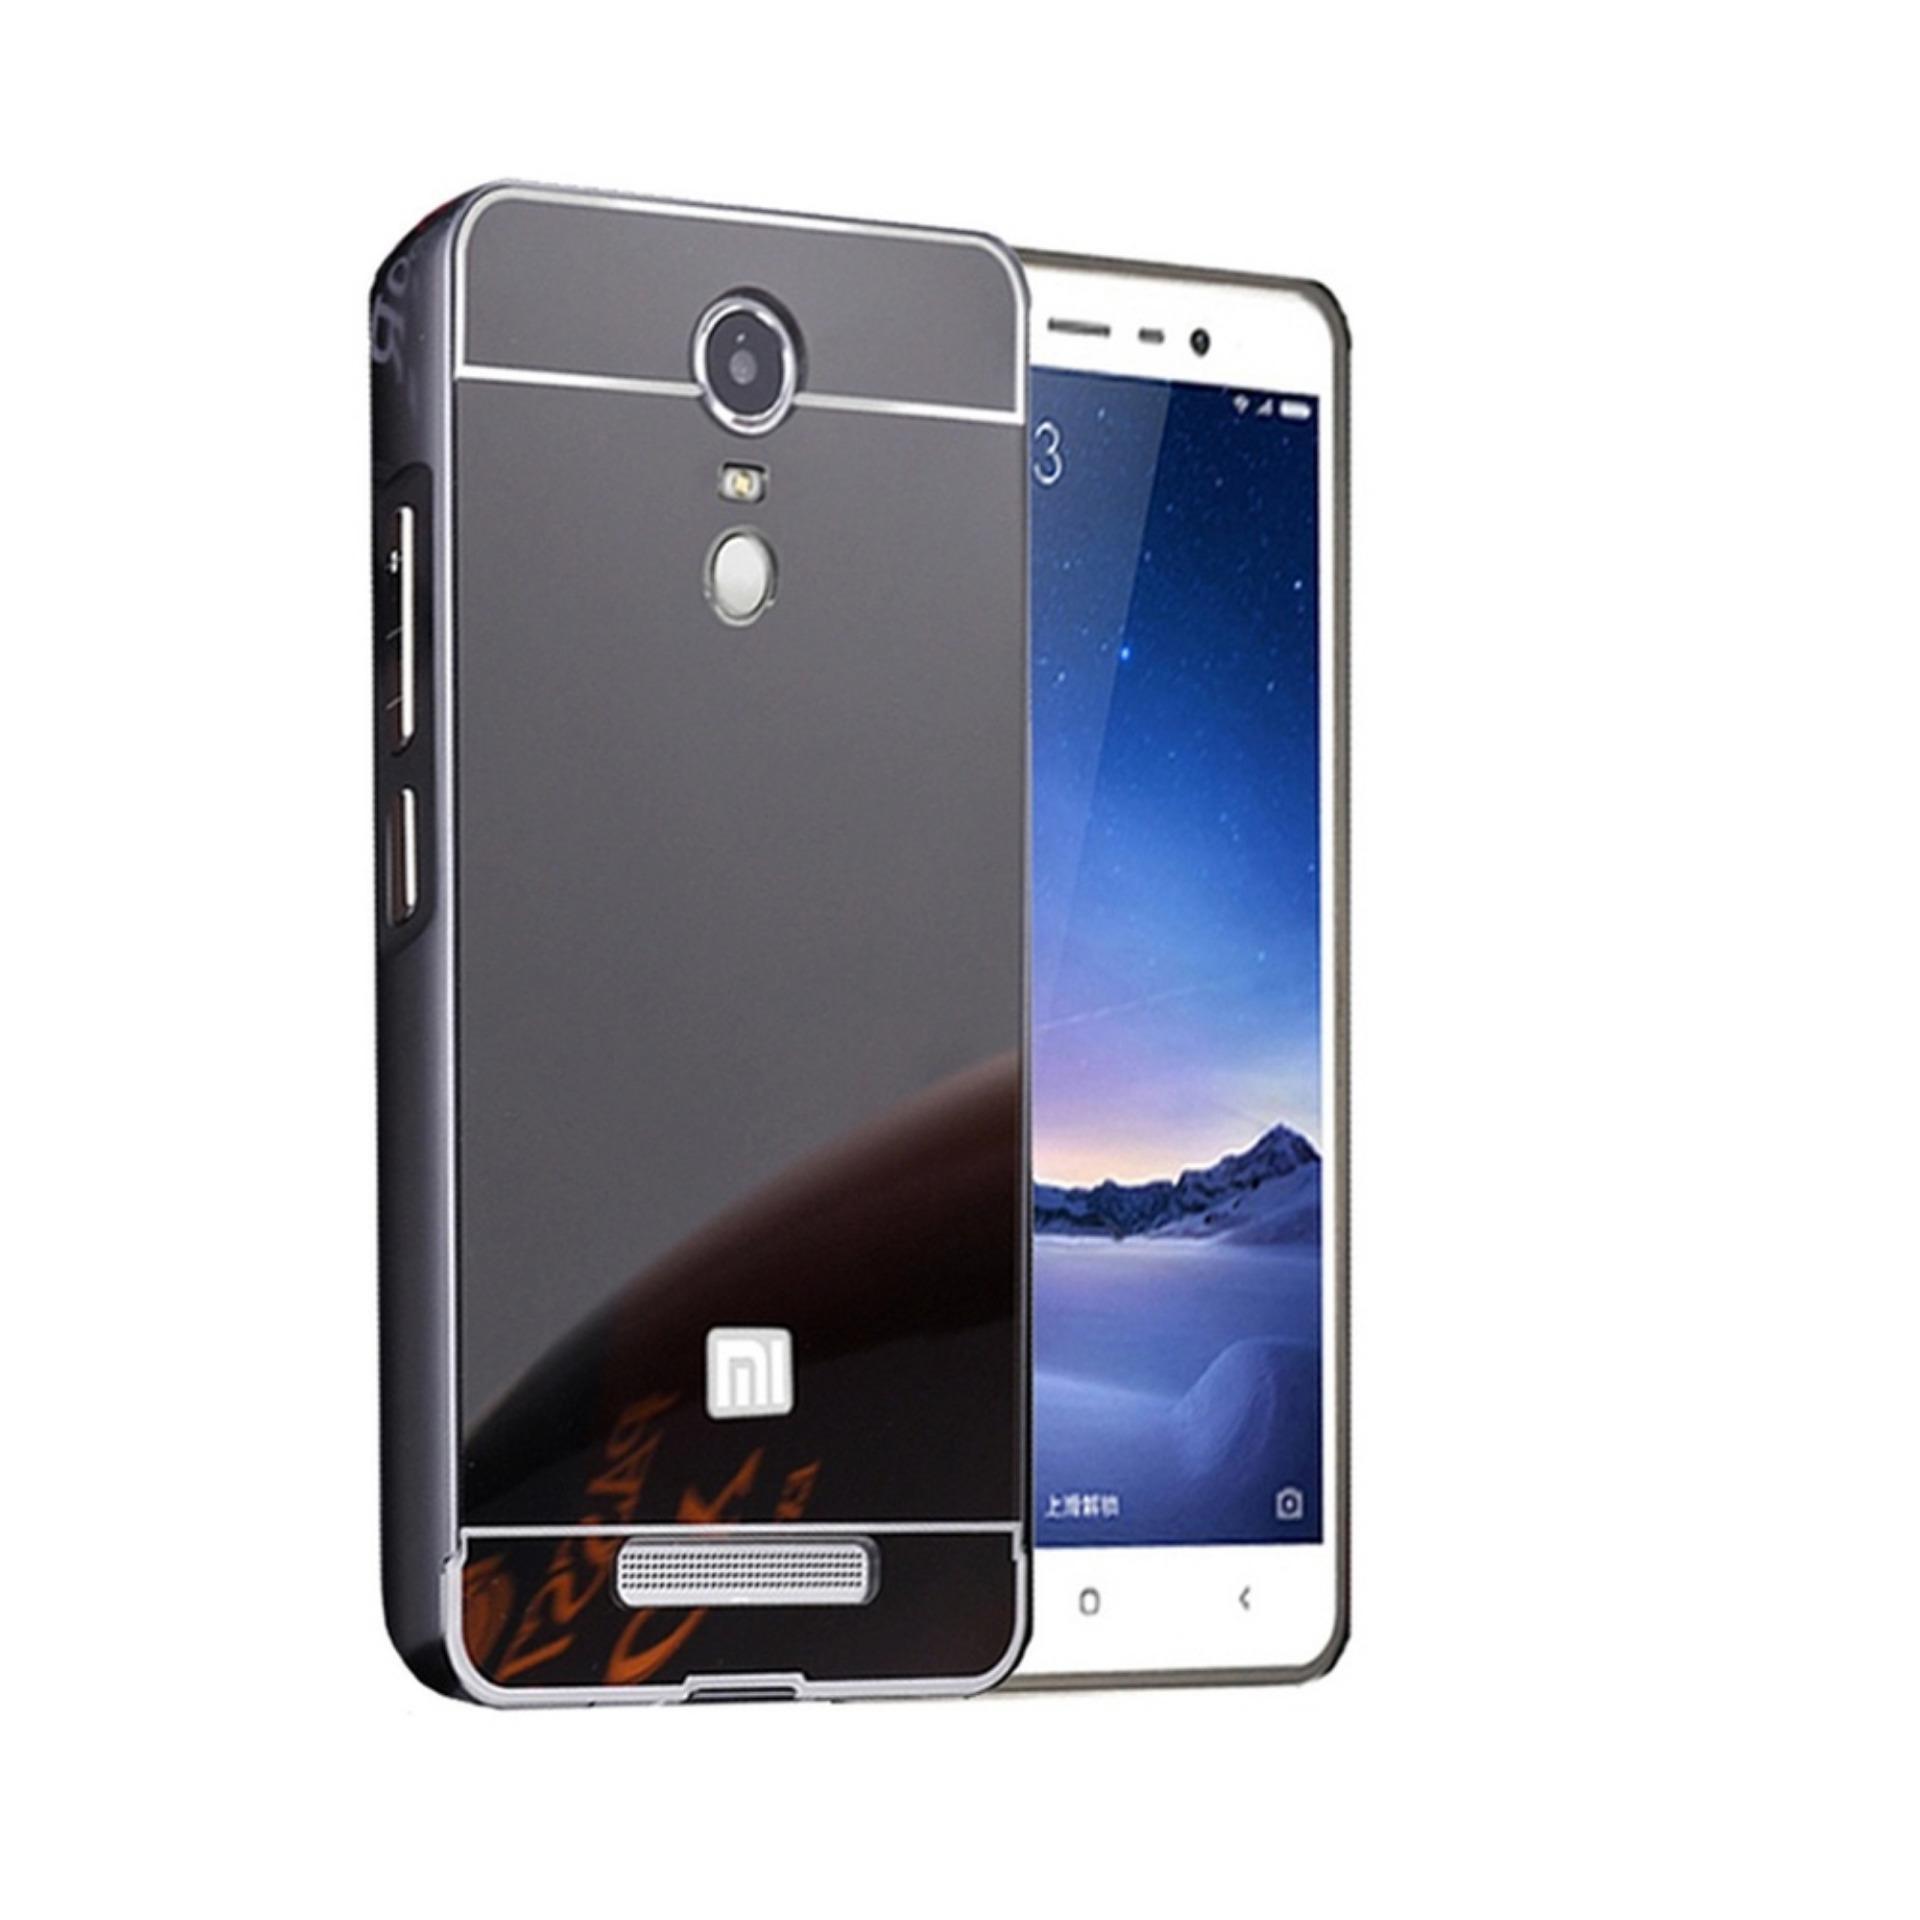 Case Mirror Slide Xiaomi Redmi Note 4 Bumper Mirror Slide Hitam Tempered Glass .